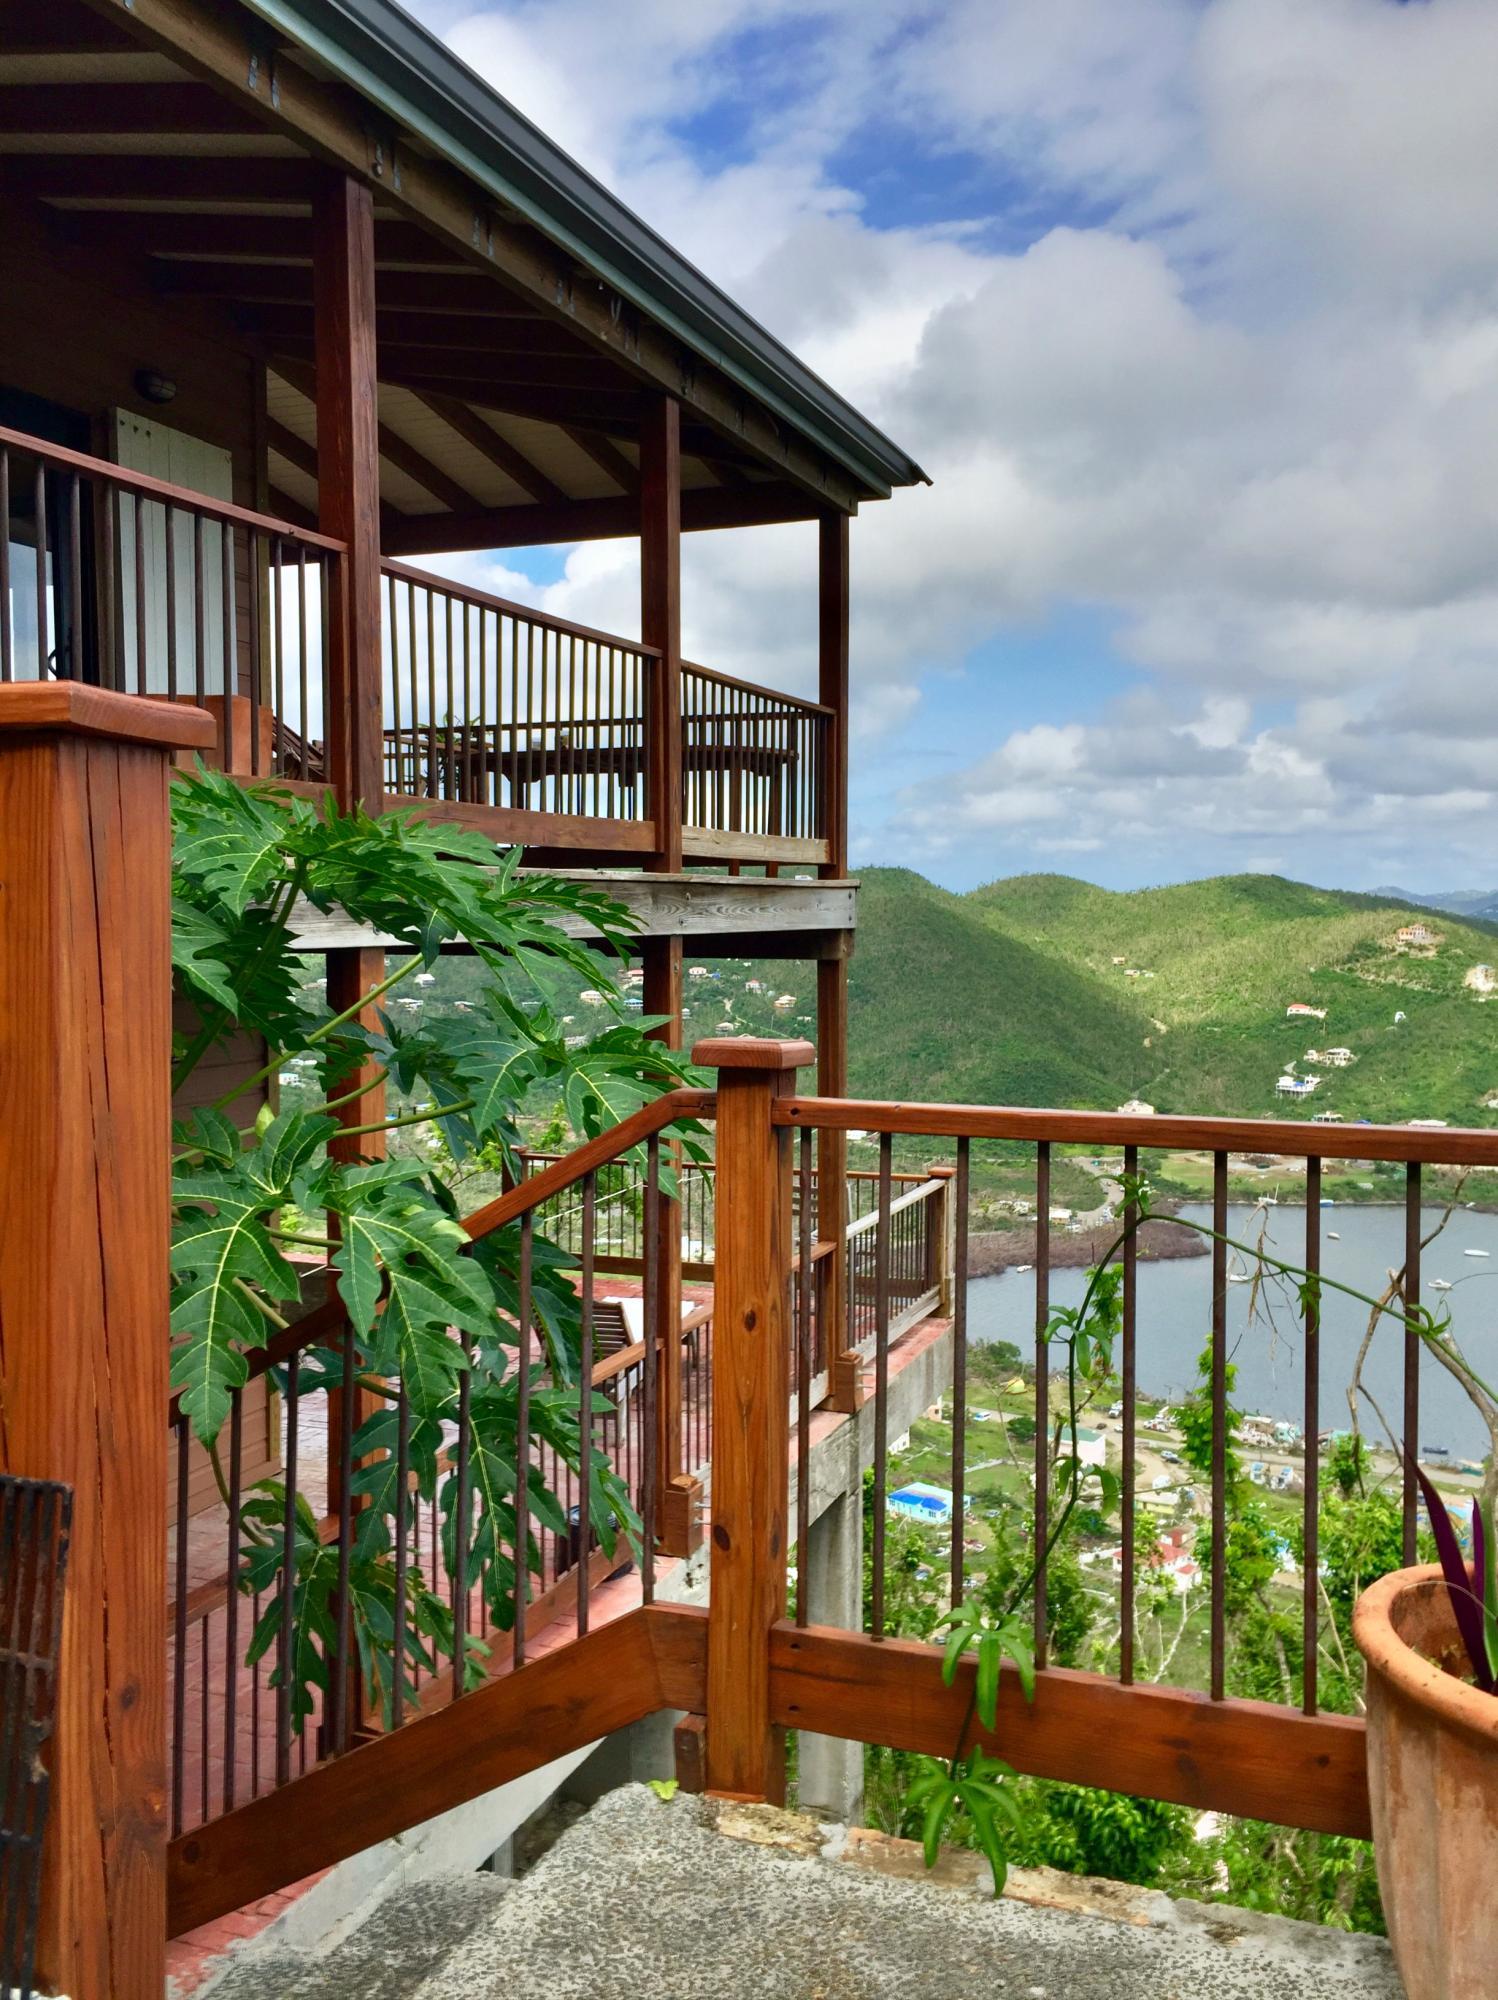 St John, Virgin Islands 00830, 3 Bedrooms Bedrooms, ,3 BathroomsBathrooms,Residential,For Sale,17-284